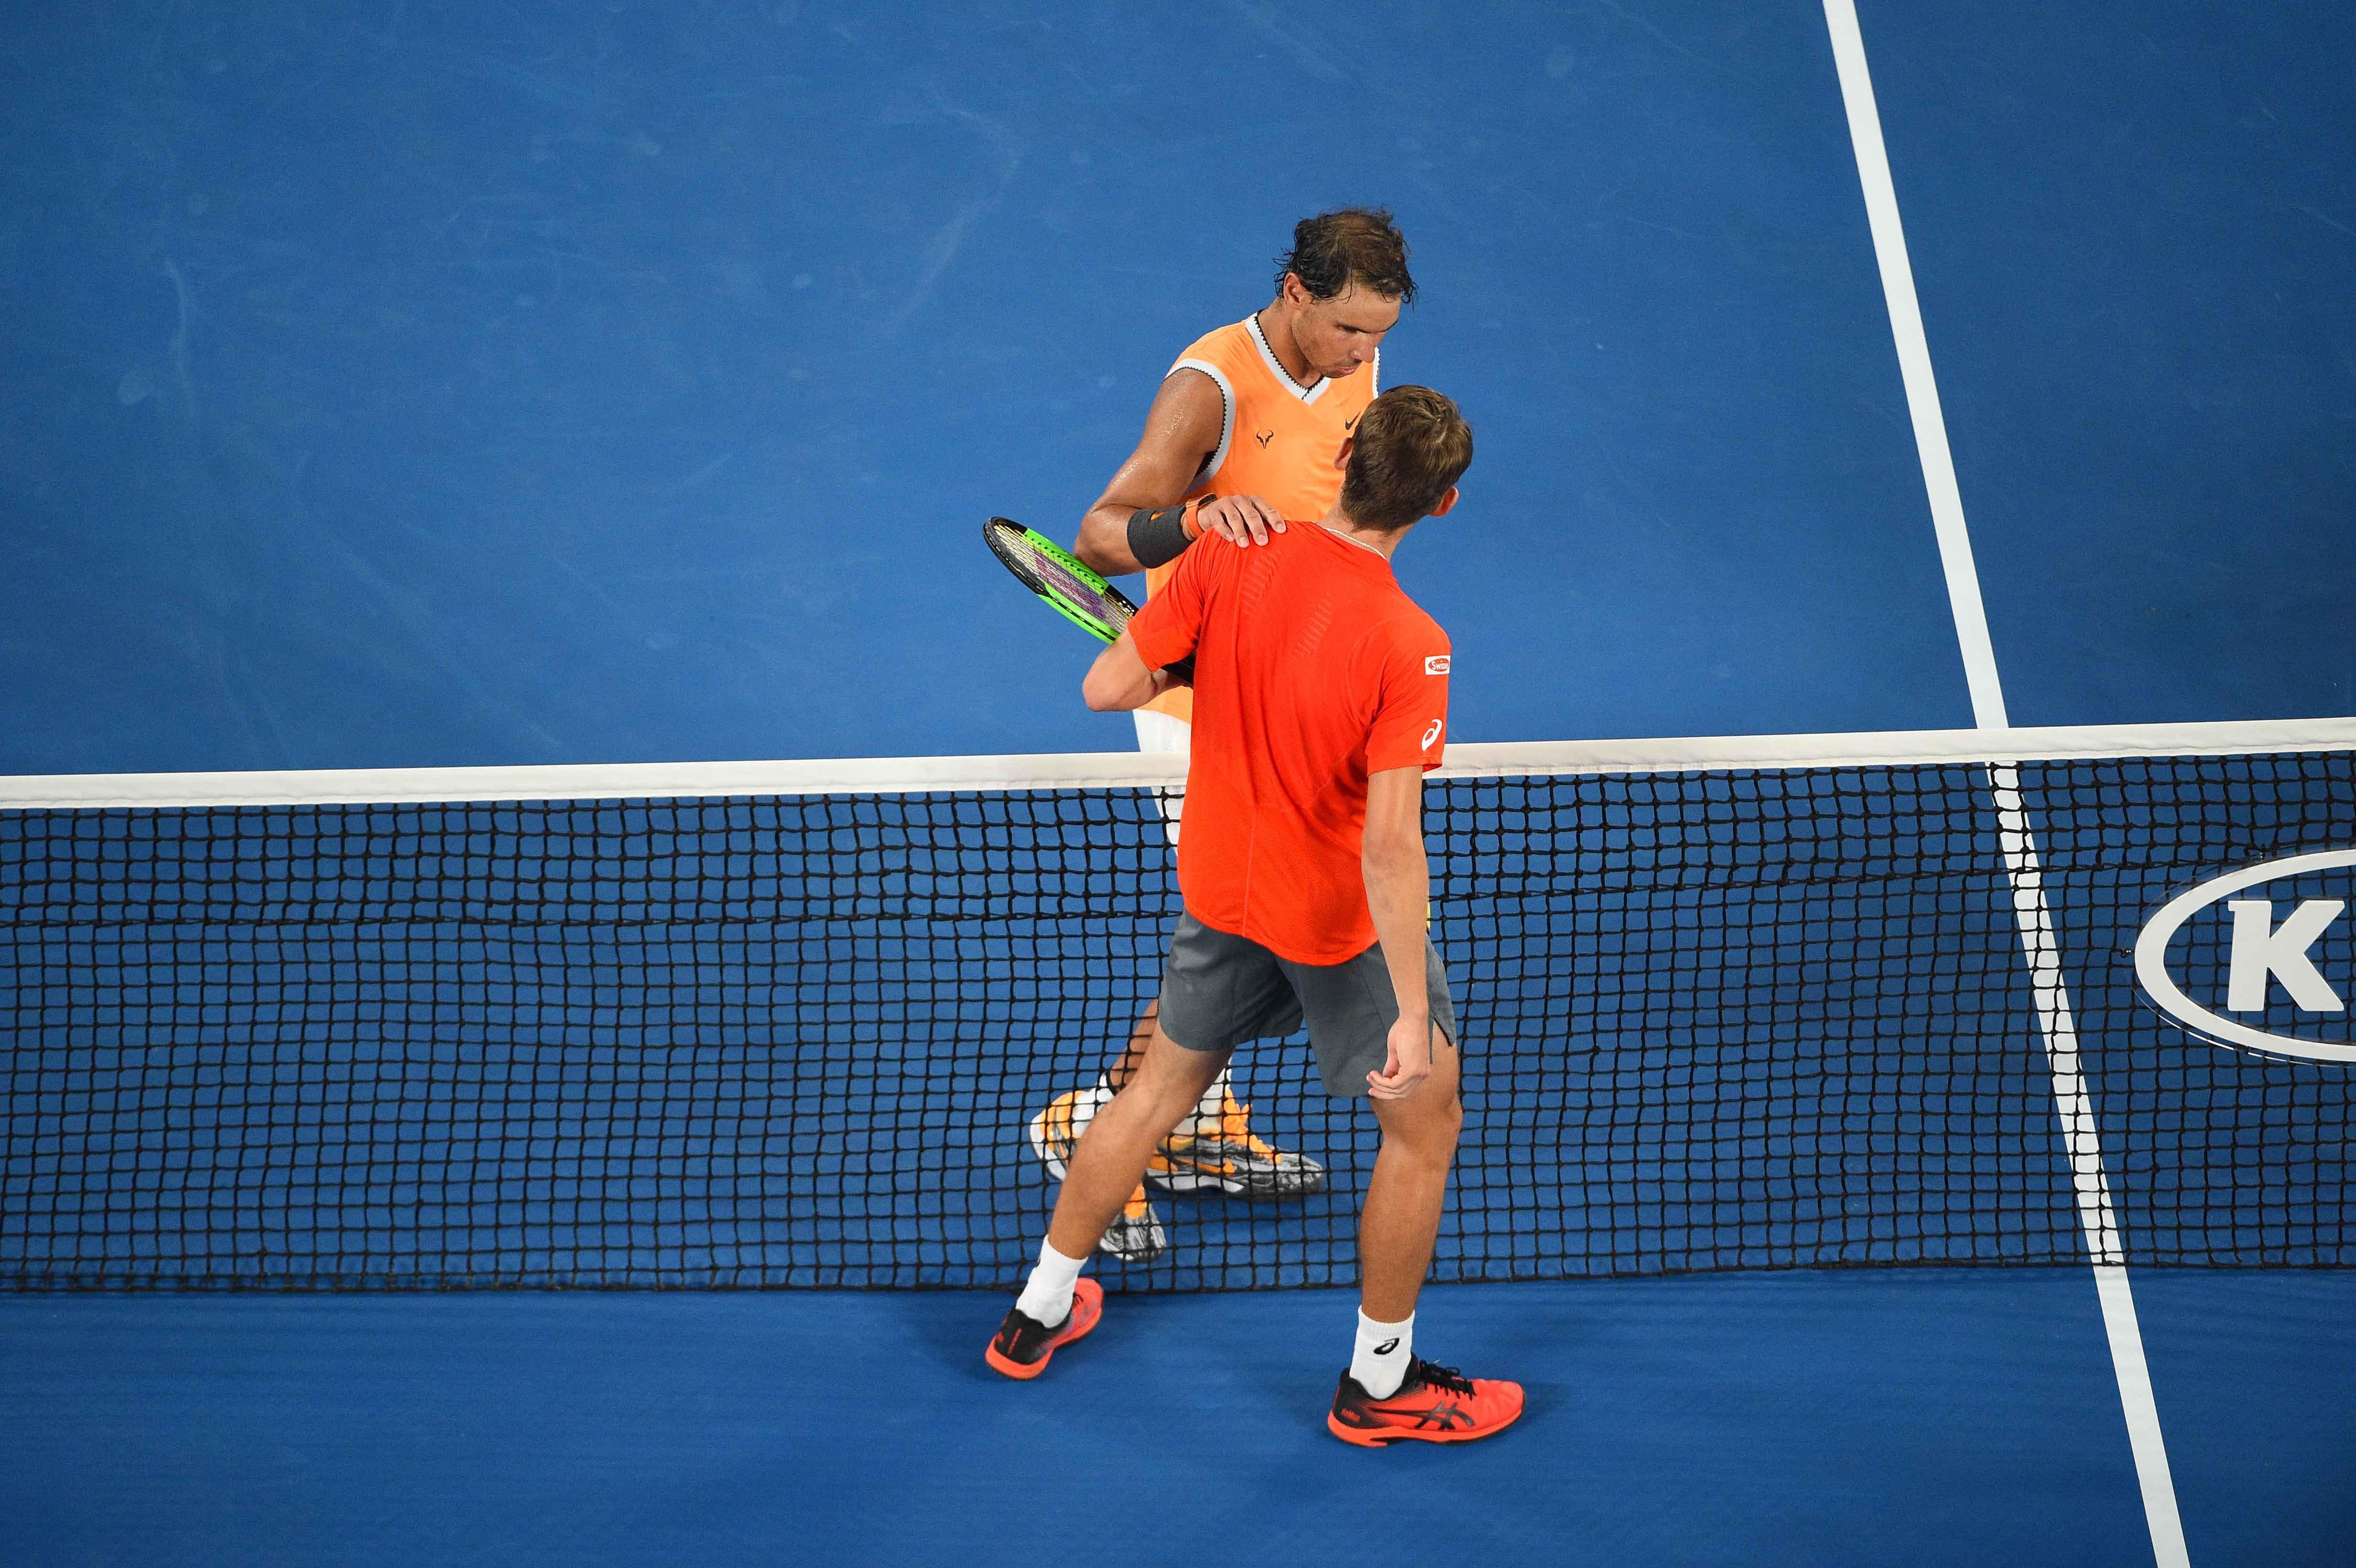 Rafael Nadal and Alex de Minaur at the net Australian Open 2019